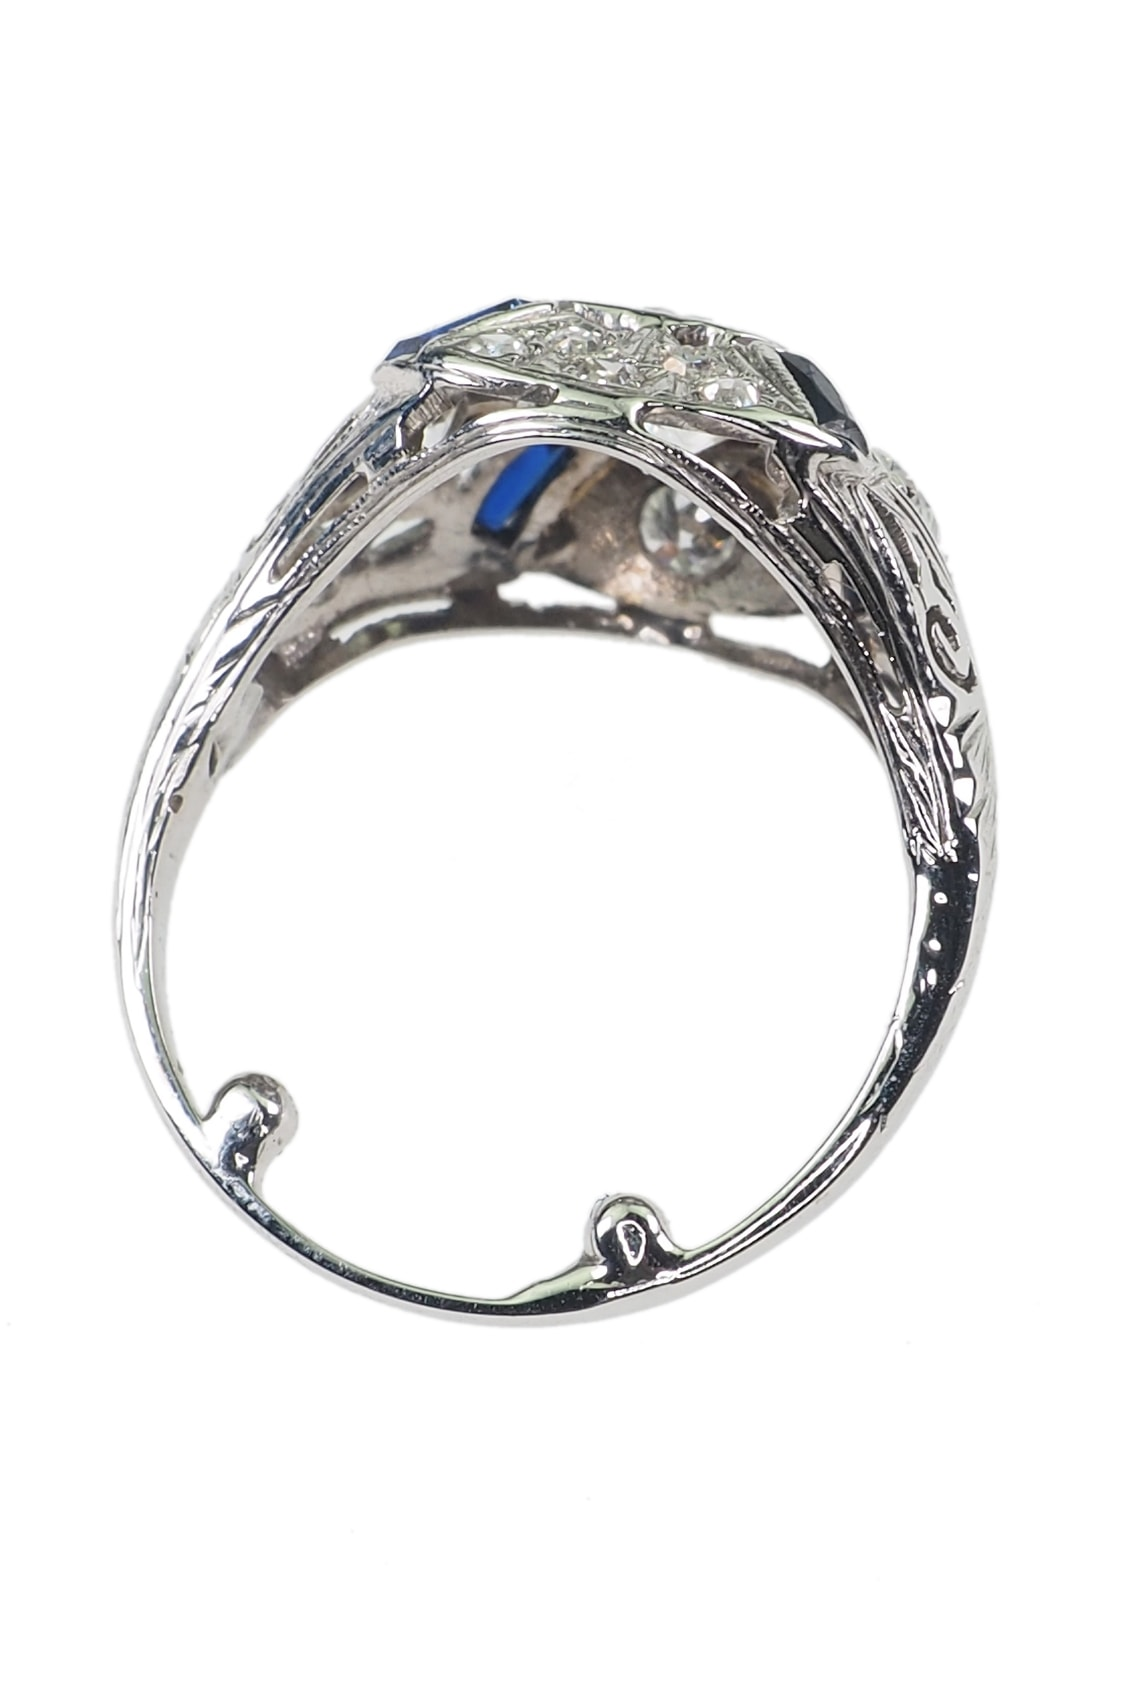 ring-0598c